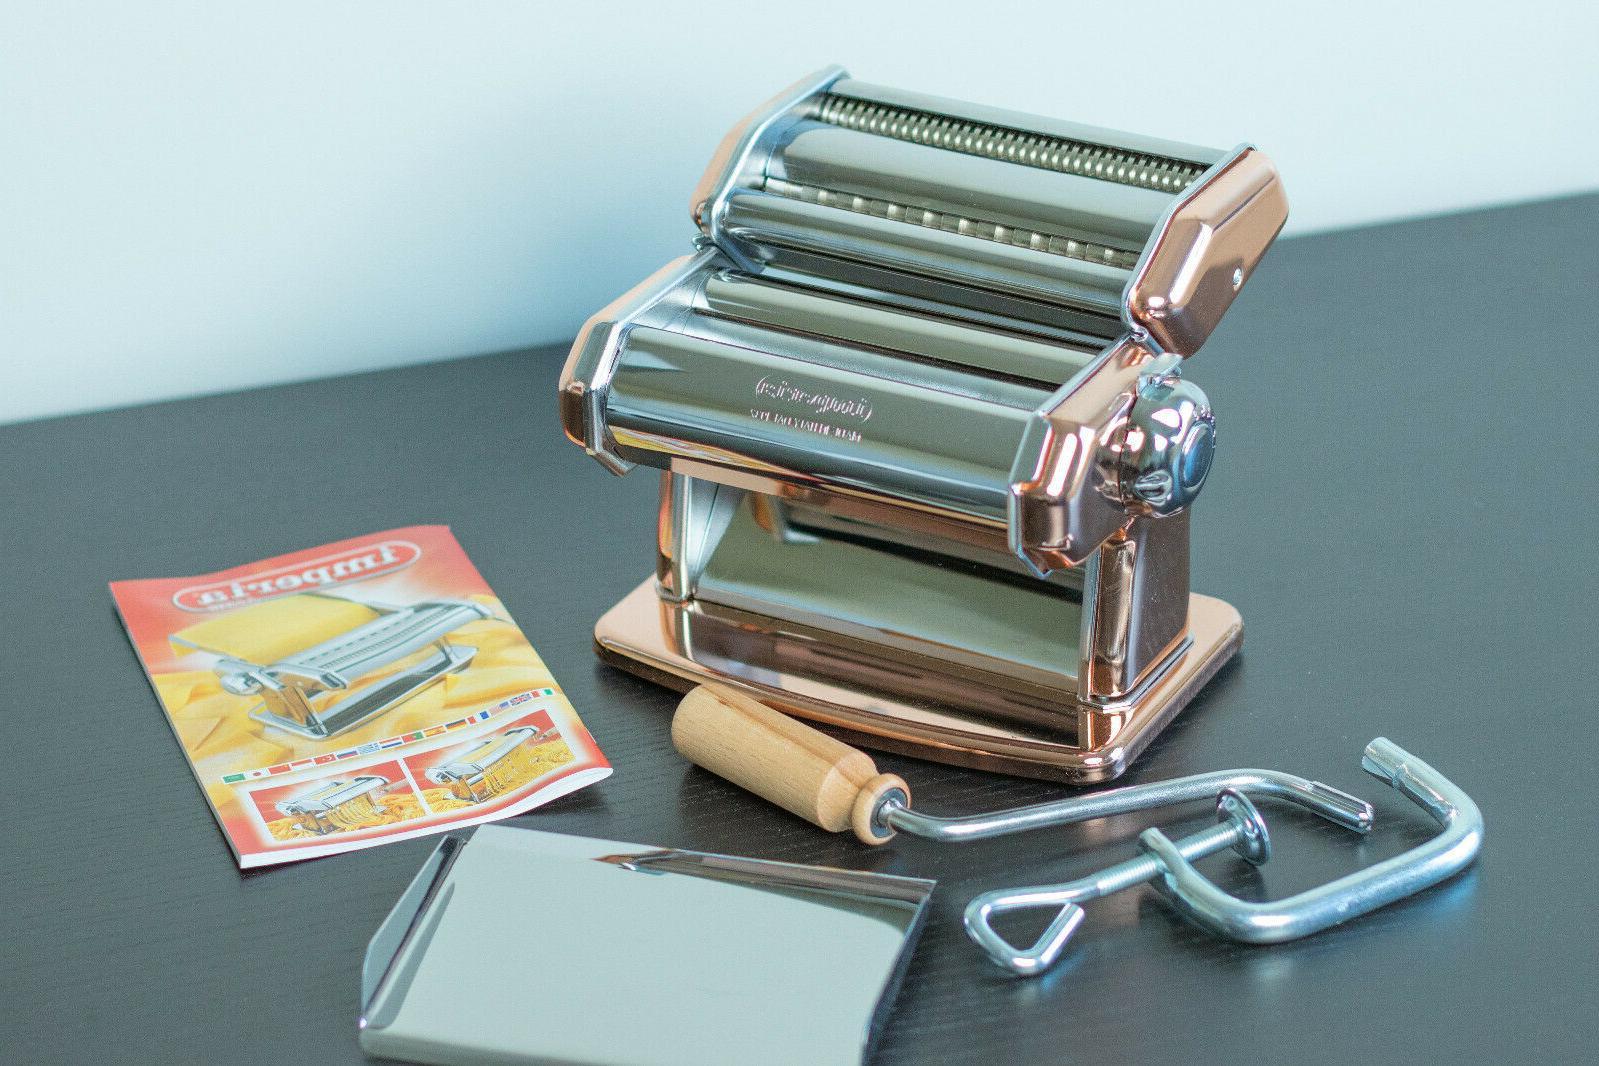 pasta maker machine heavy duty stainless steel